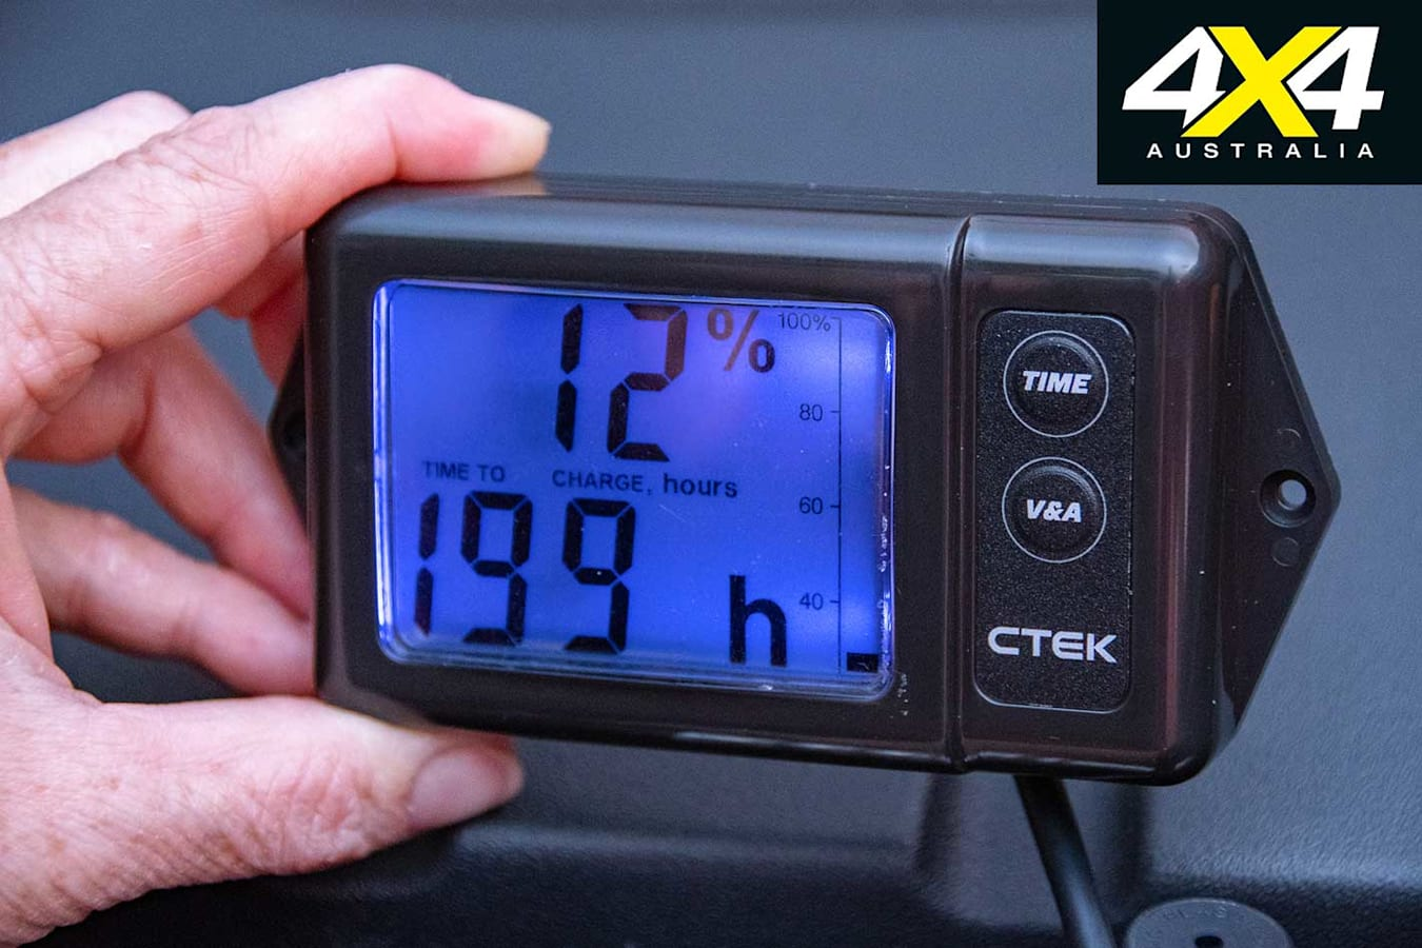 CTEK 140 A Dual Battery Management System Display Jpg